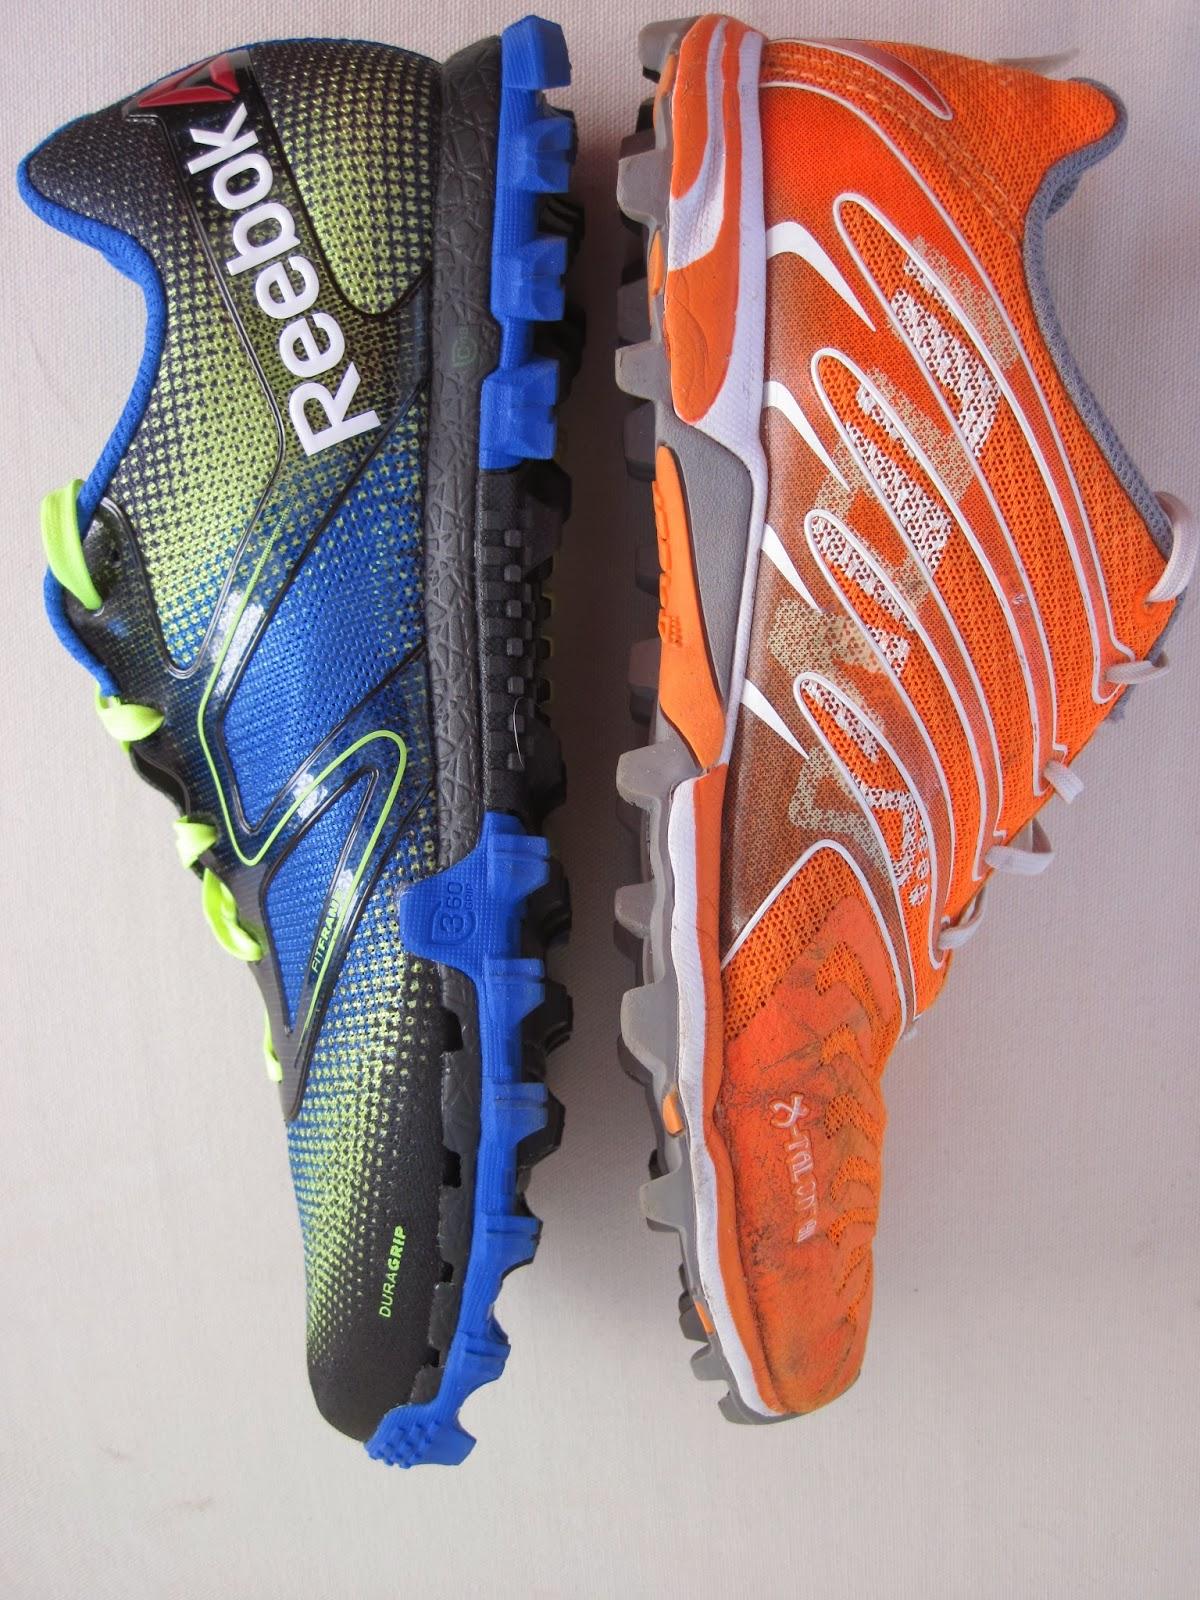 98810cb22e5b69 The MUDMAN Report  GEAR REVIEW  Reebok All-Terrain Super (OCR) shoes